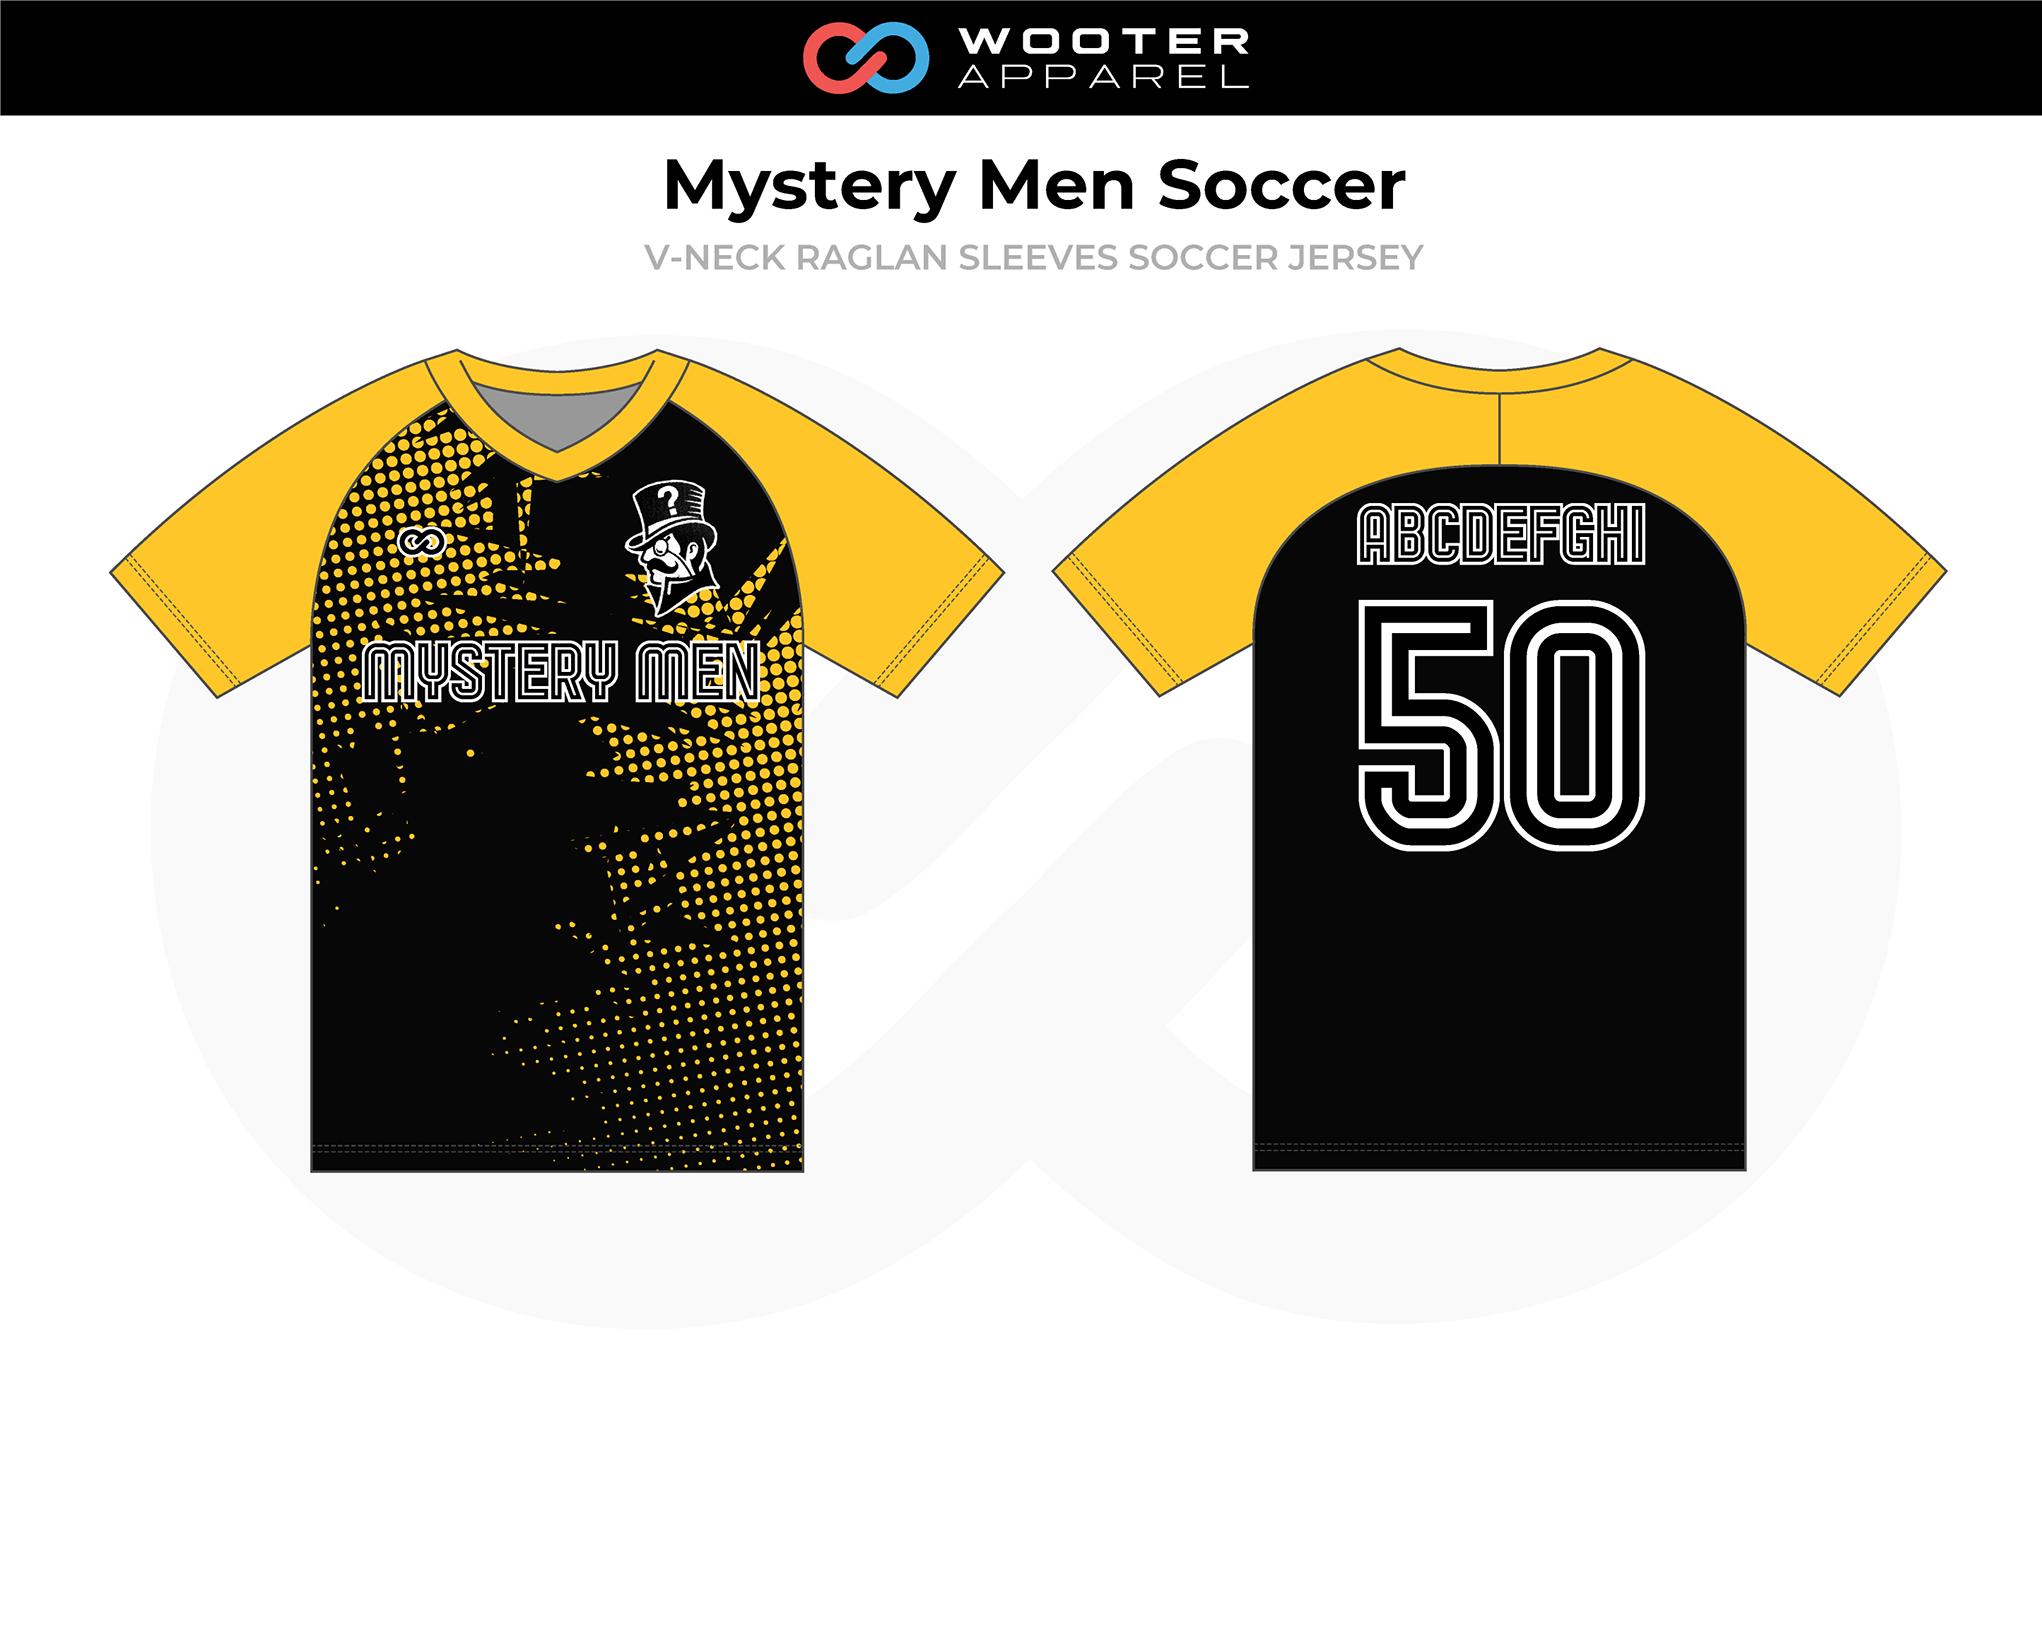 2019-03-08 Mystery Men Soccer Crew-Neck Raglan Sleeve Jersey (B).png